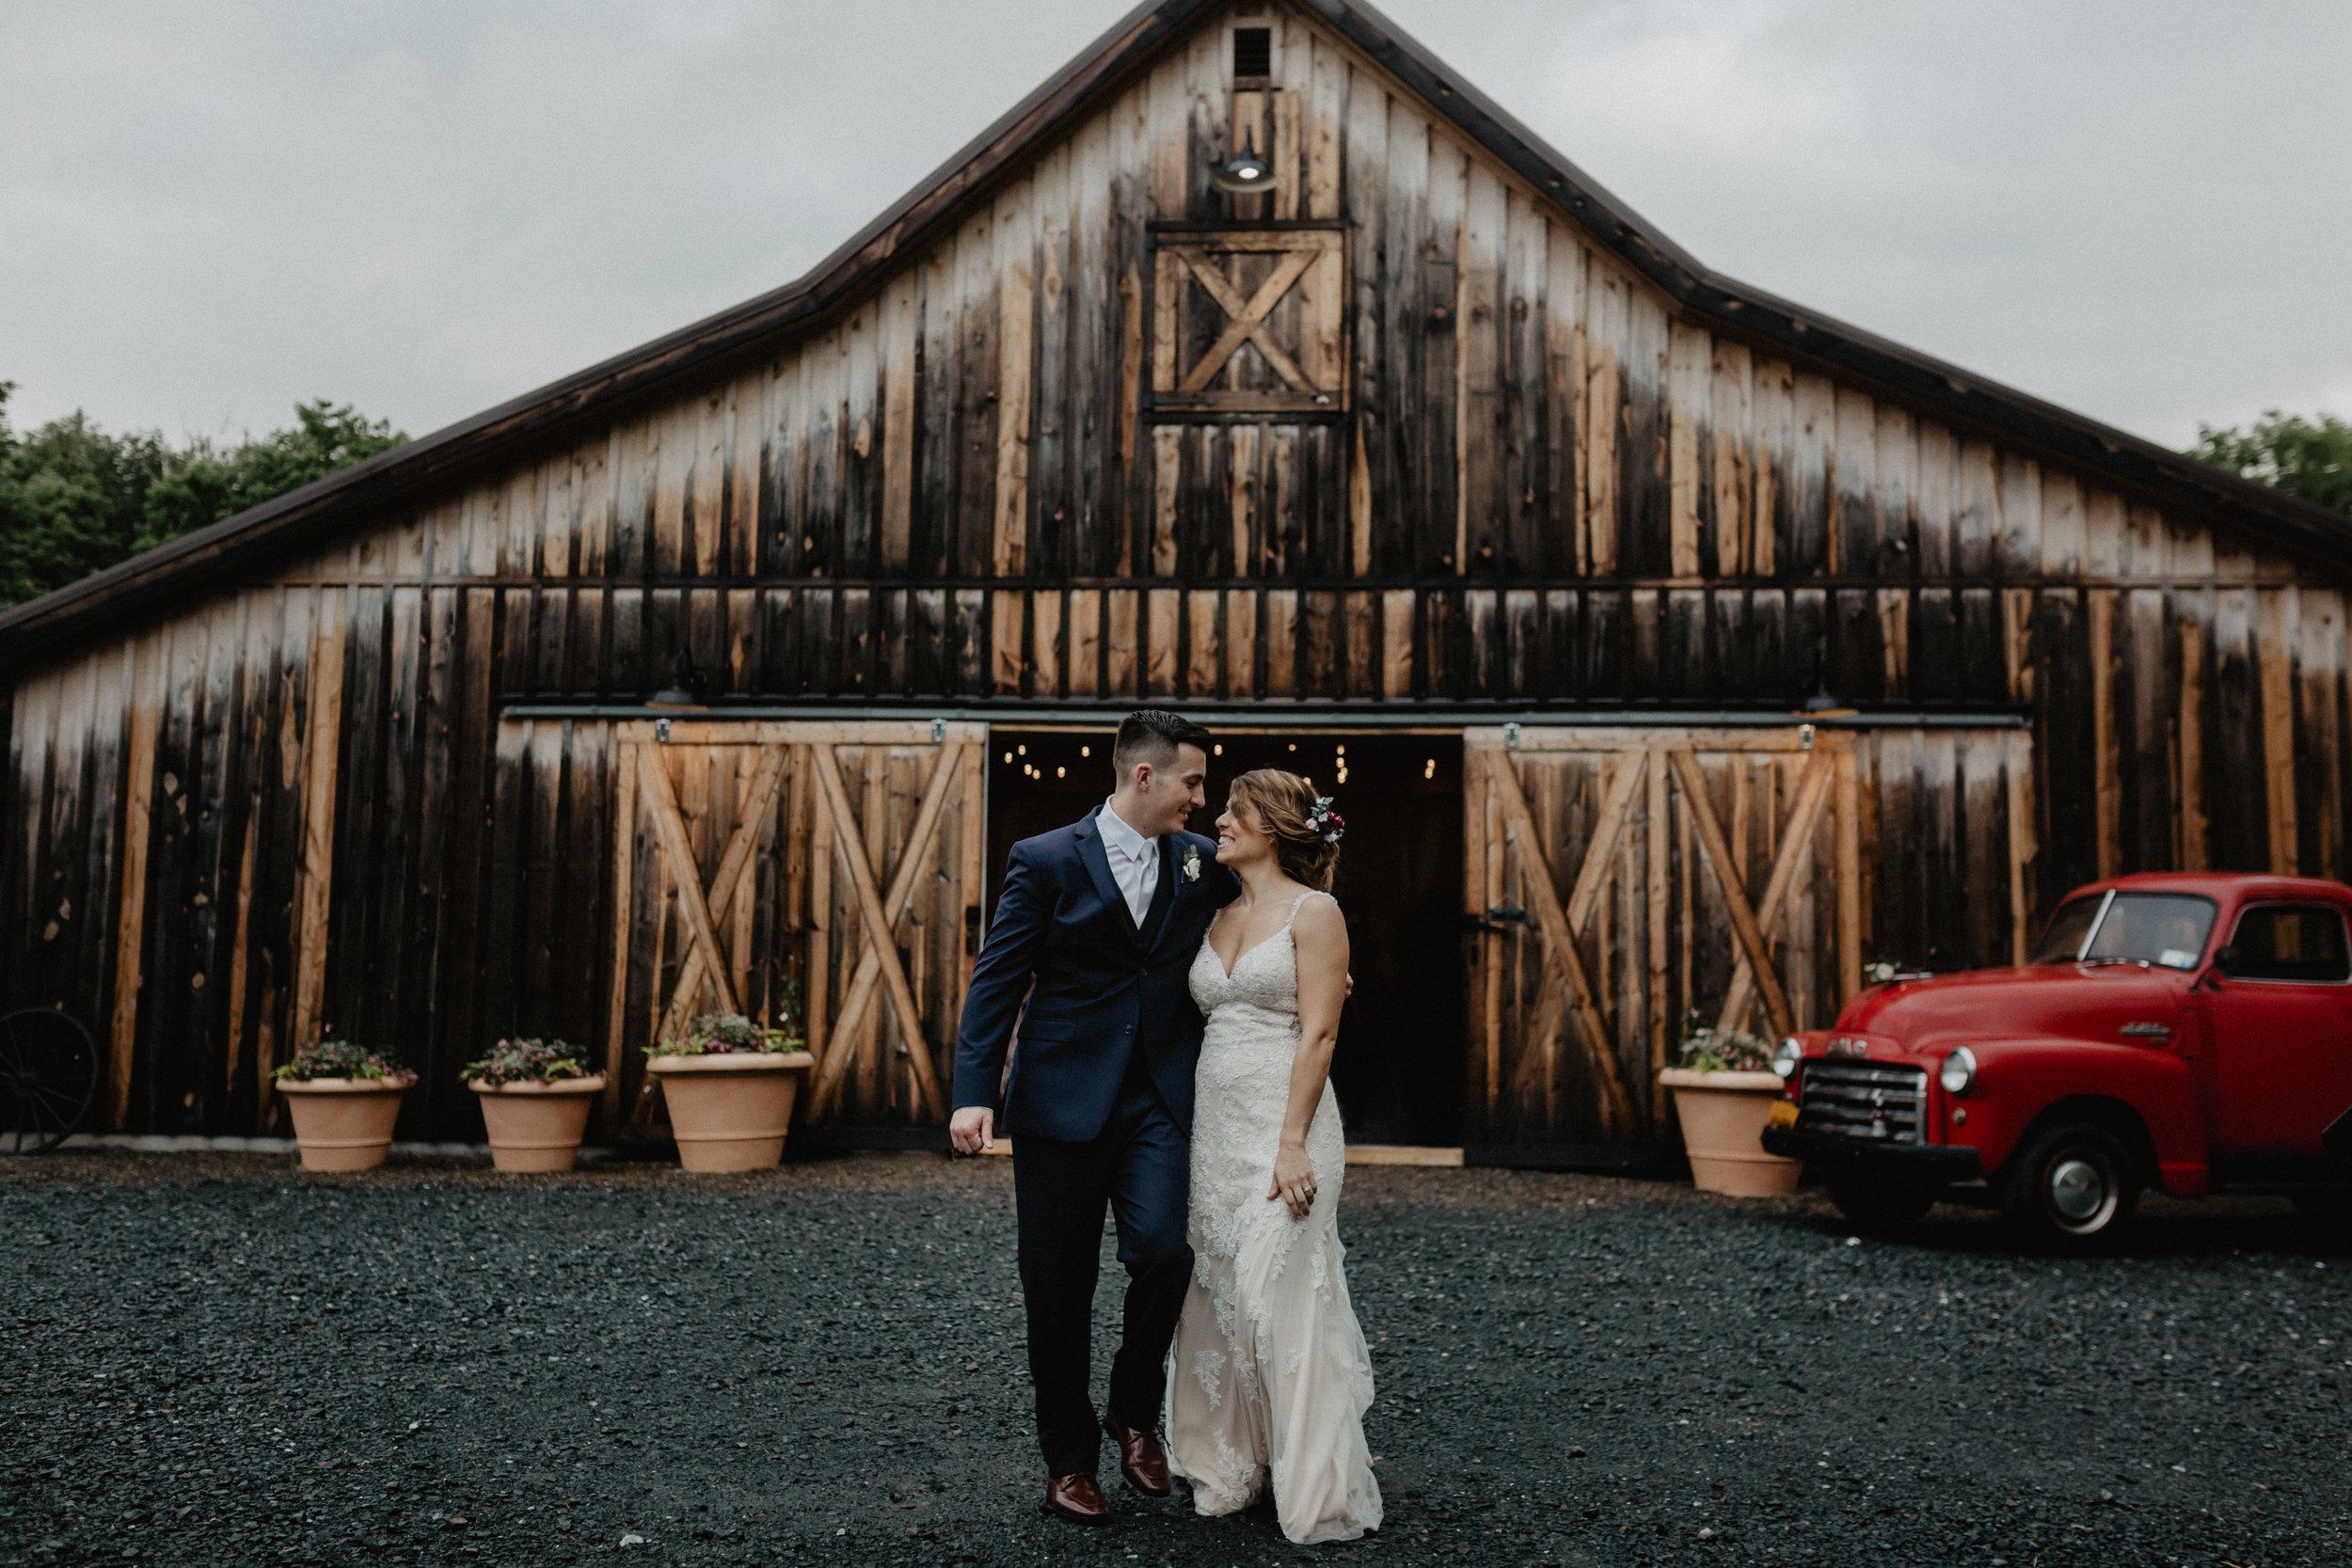 greywacke-meadows-wedding_065.jpg